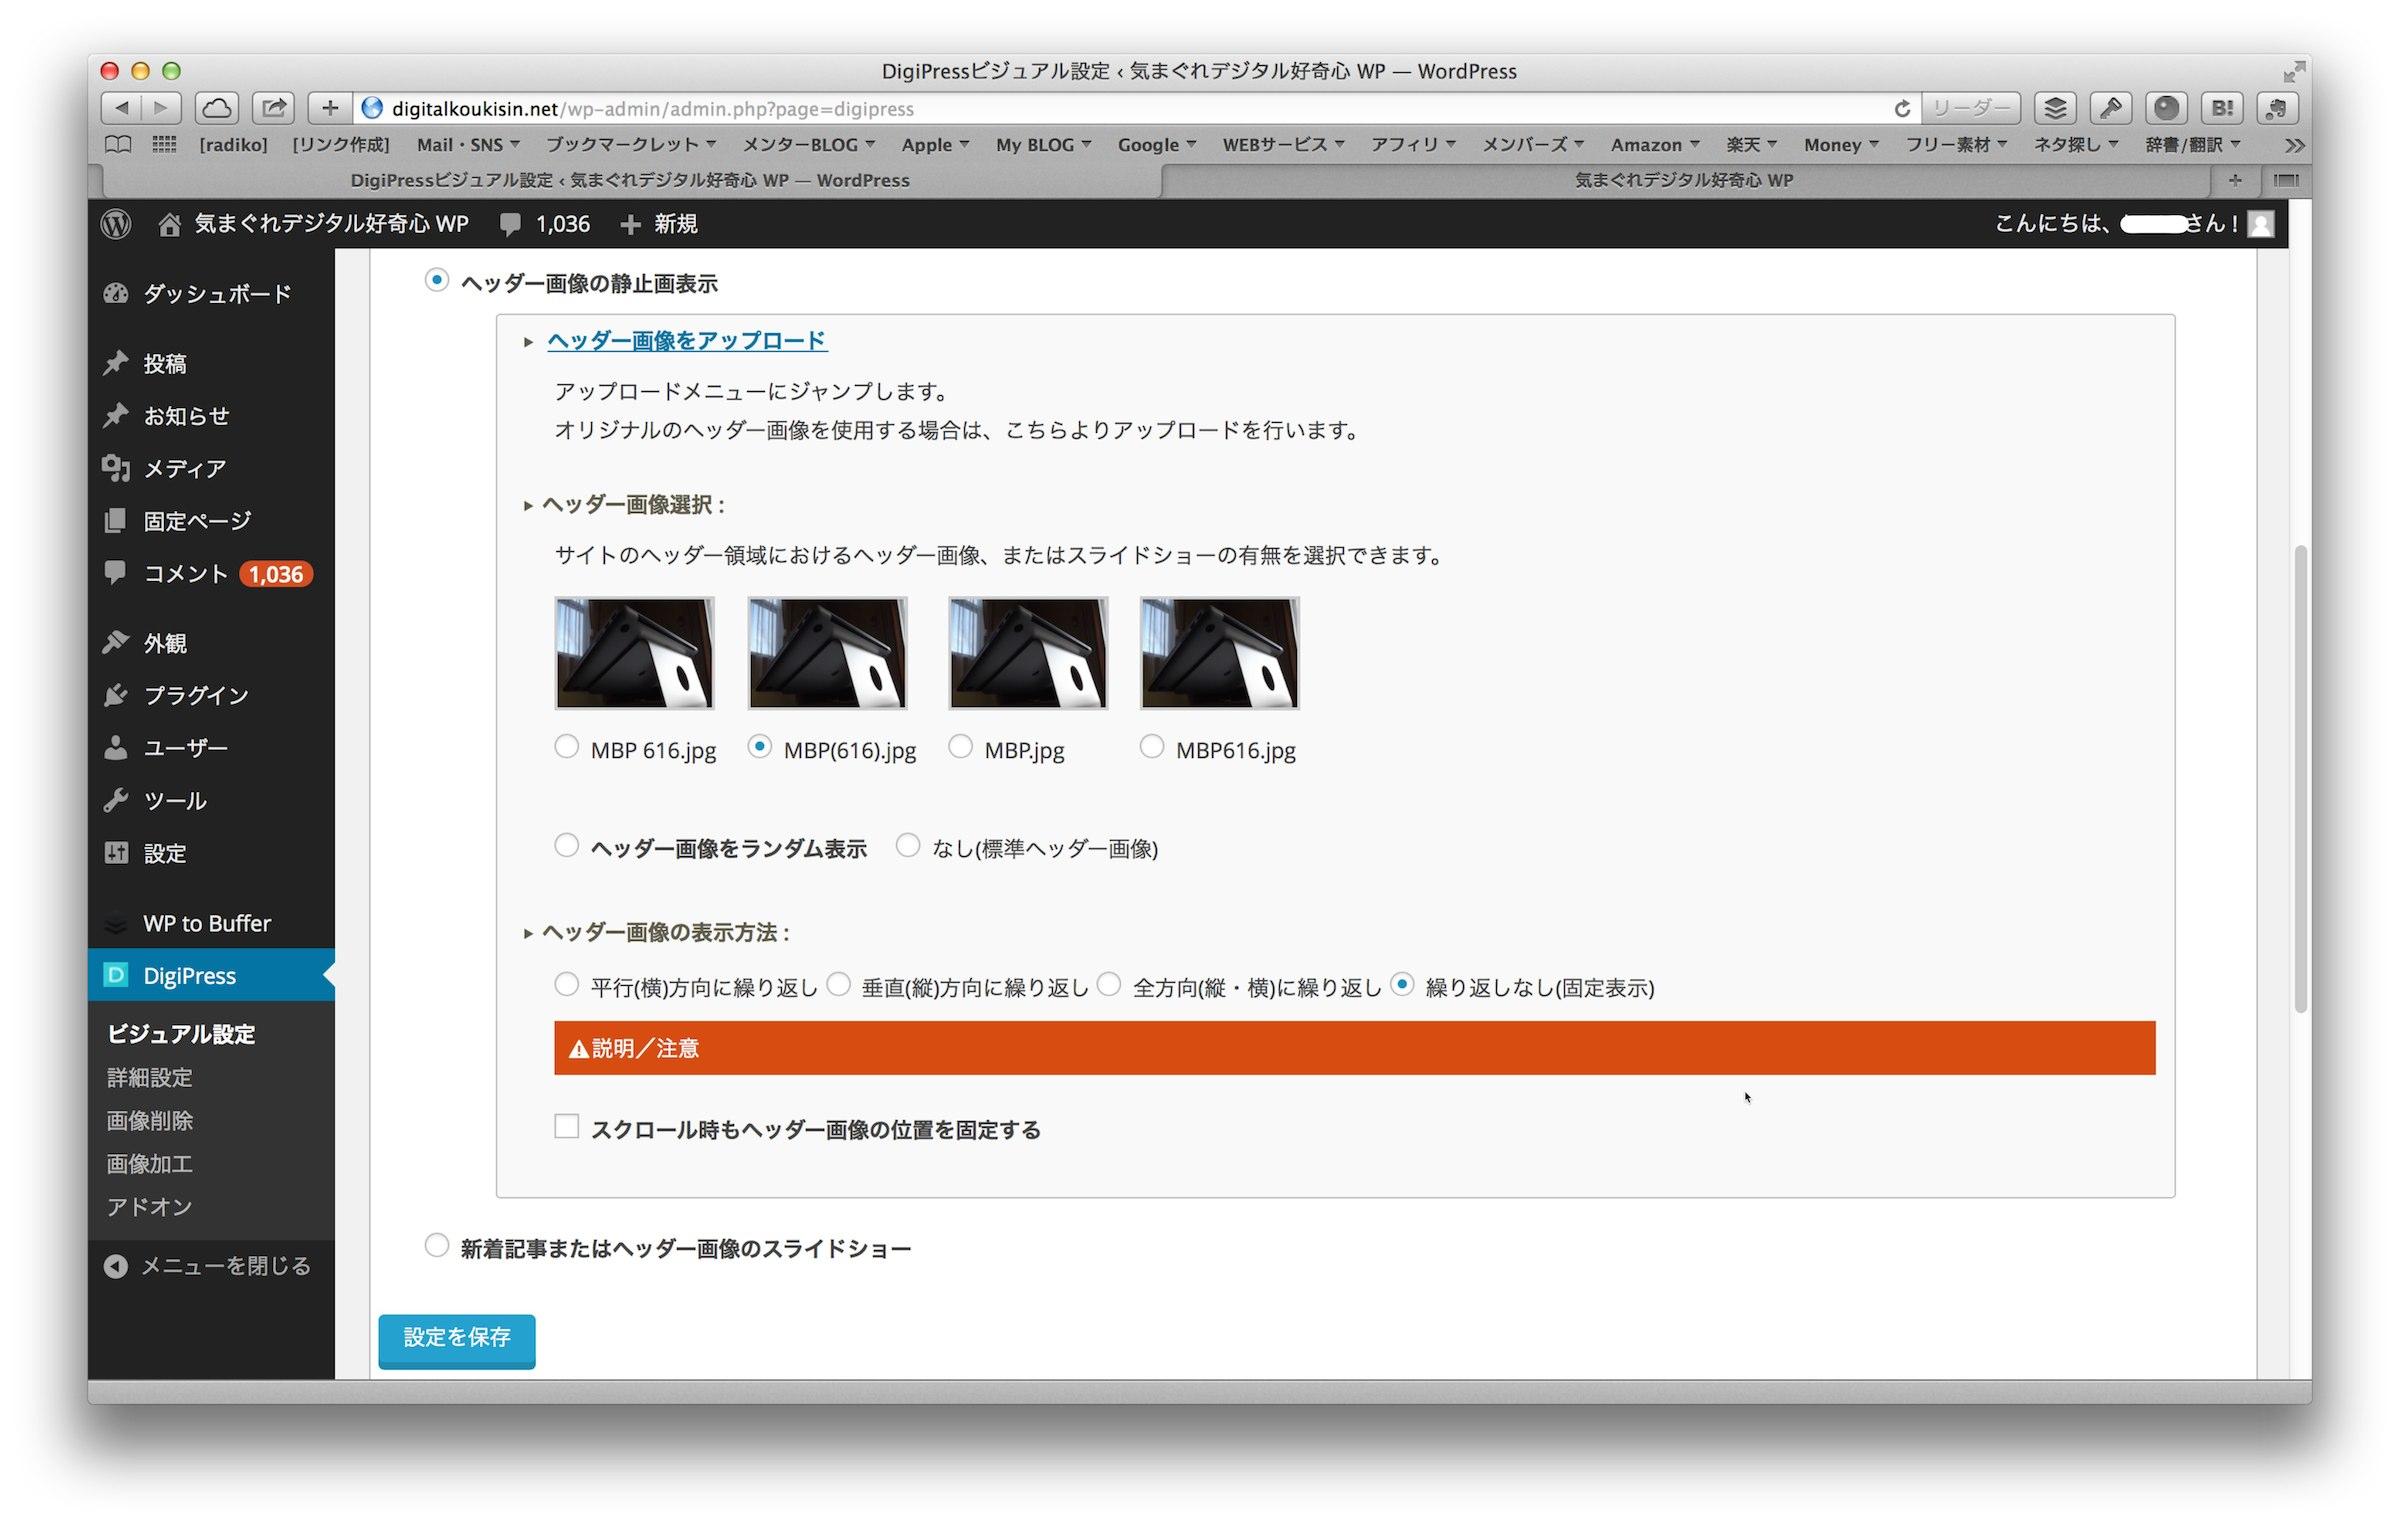 DigiPressビジュアル設定 ‹ 気まぐれデジタル好奇心 WP — WordPress